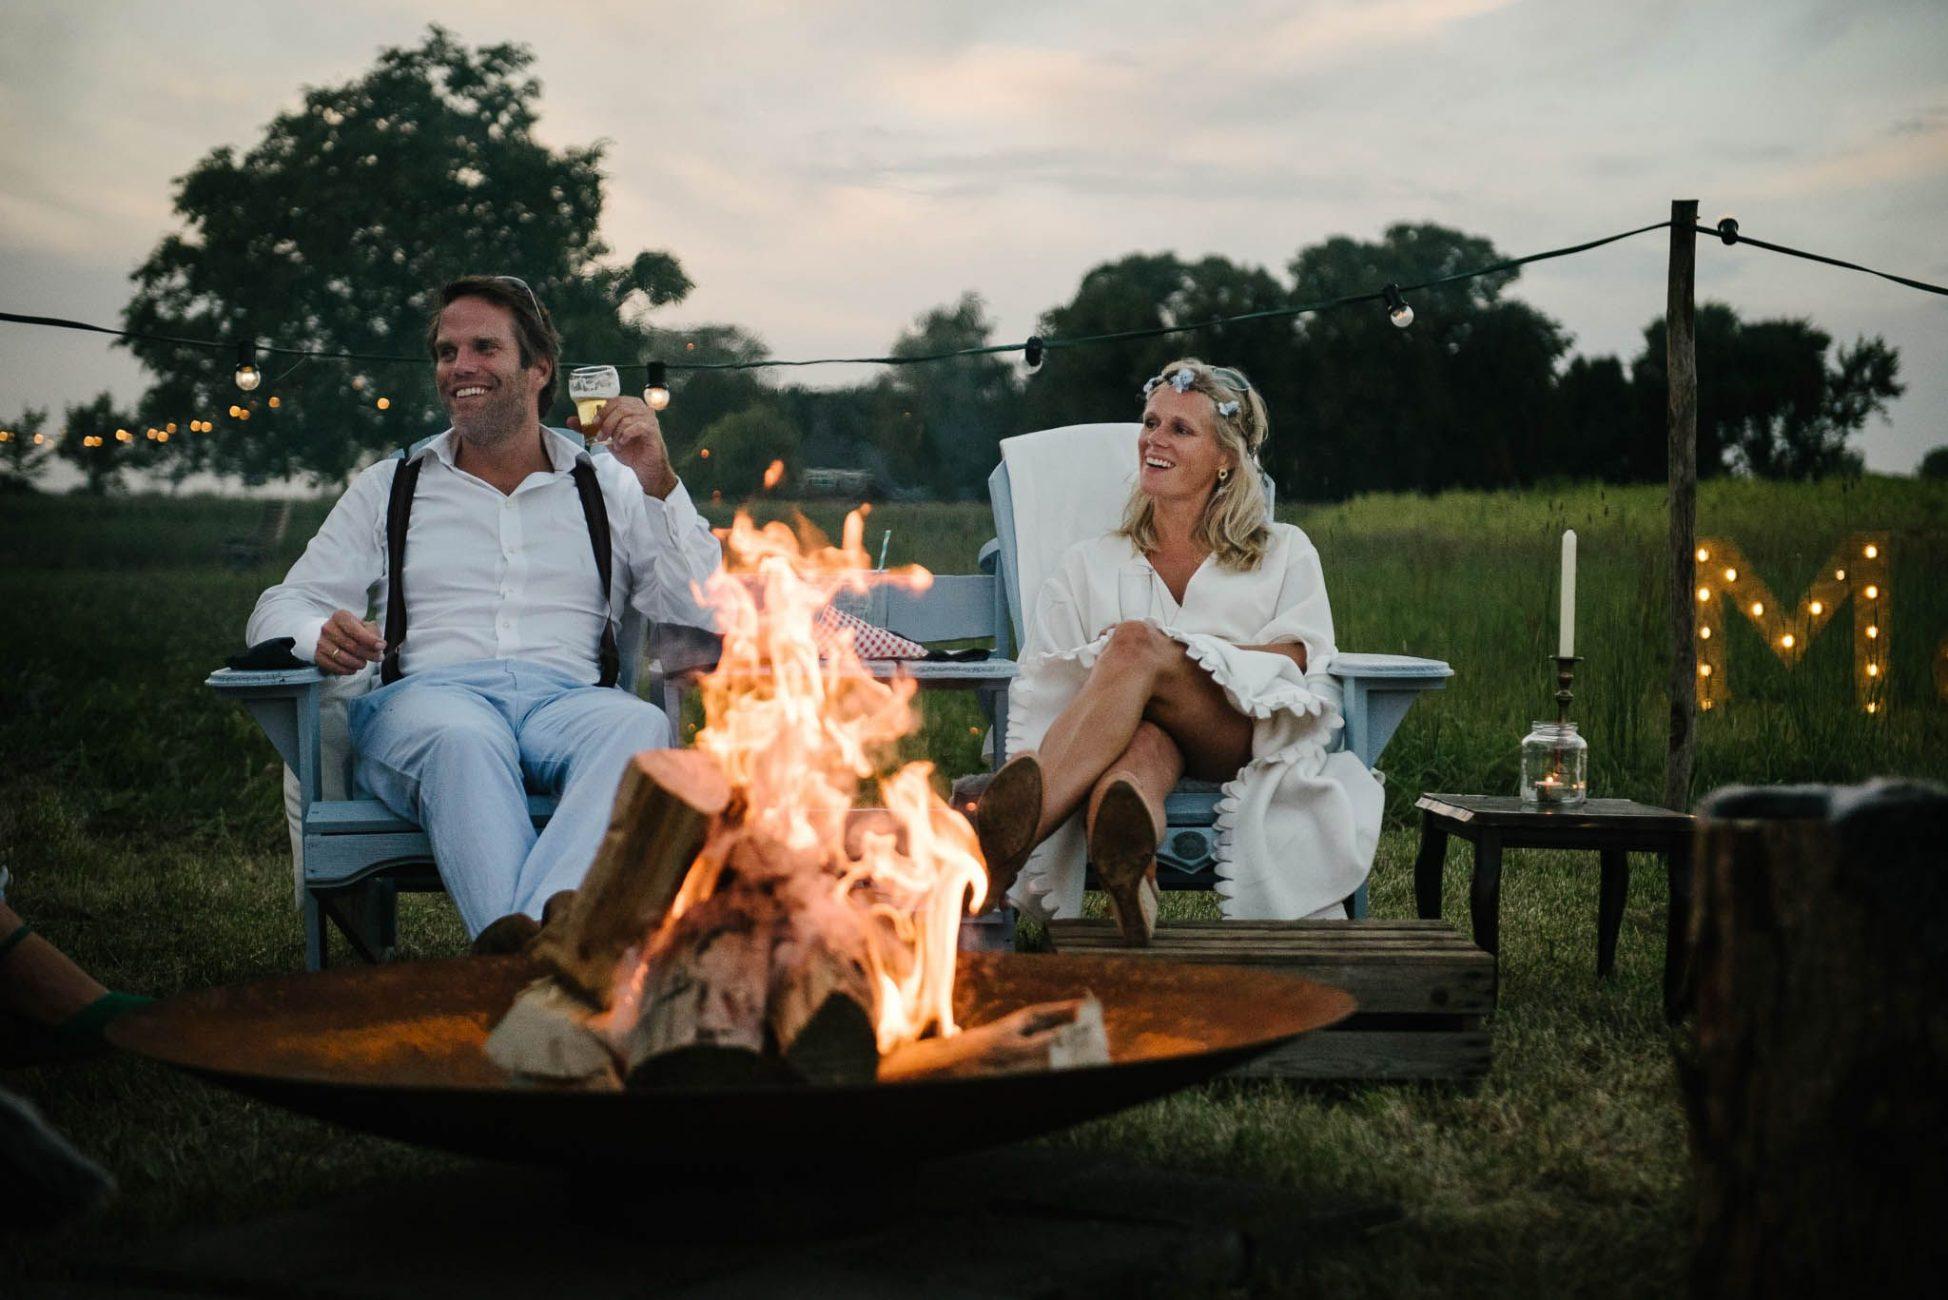 bruiloft bohemian stijl buiten vuurkorf